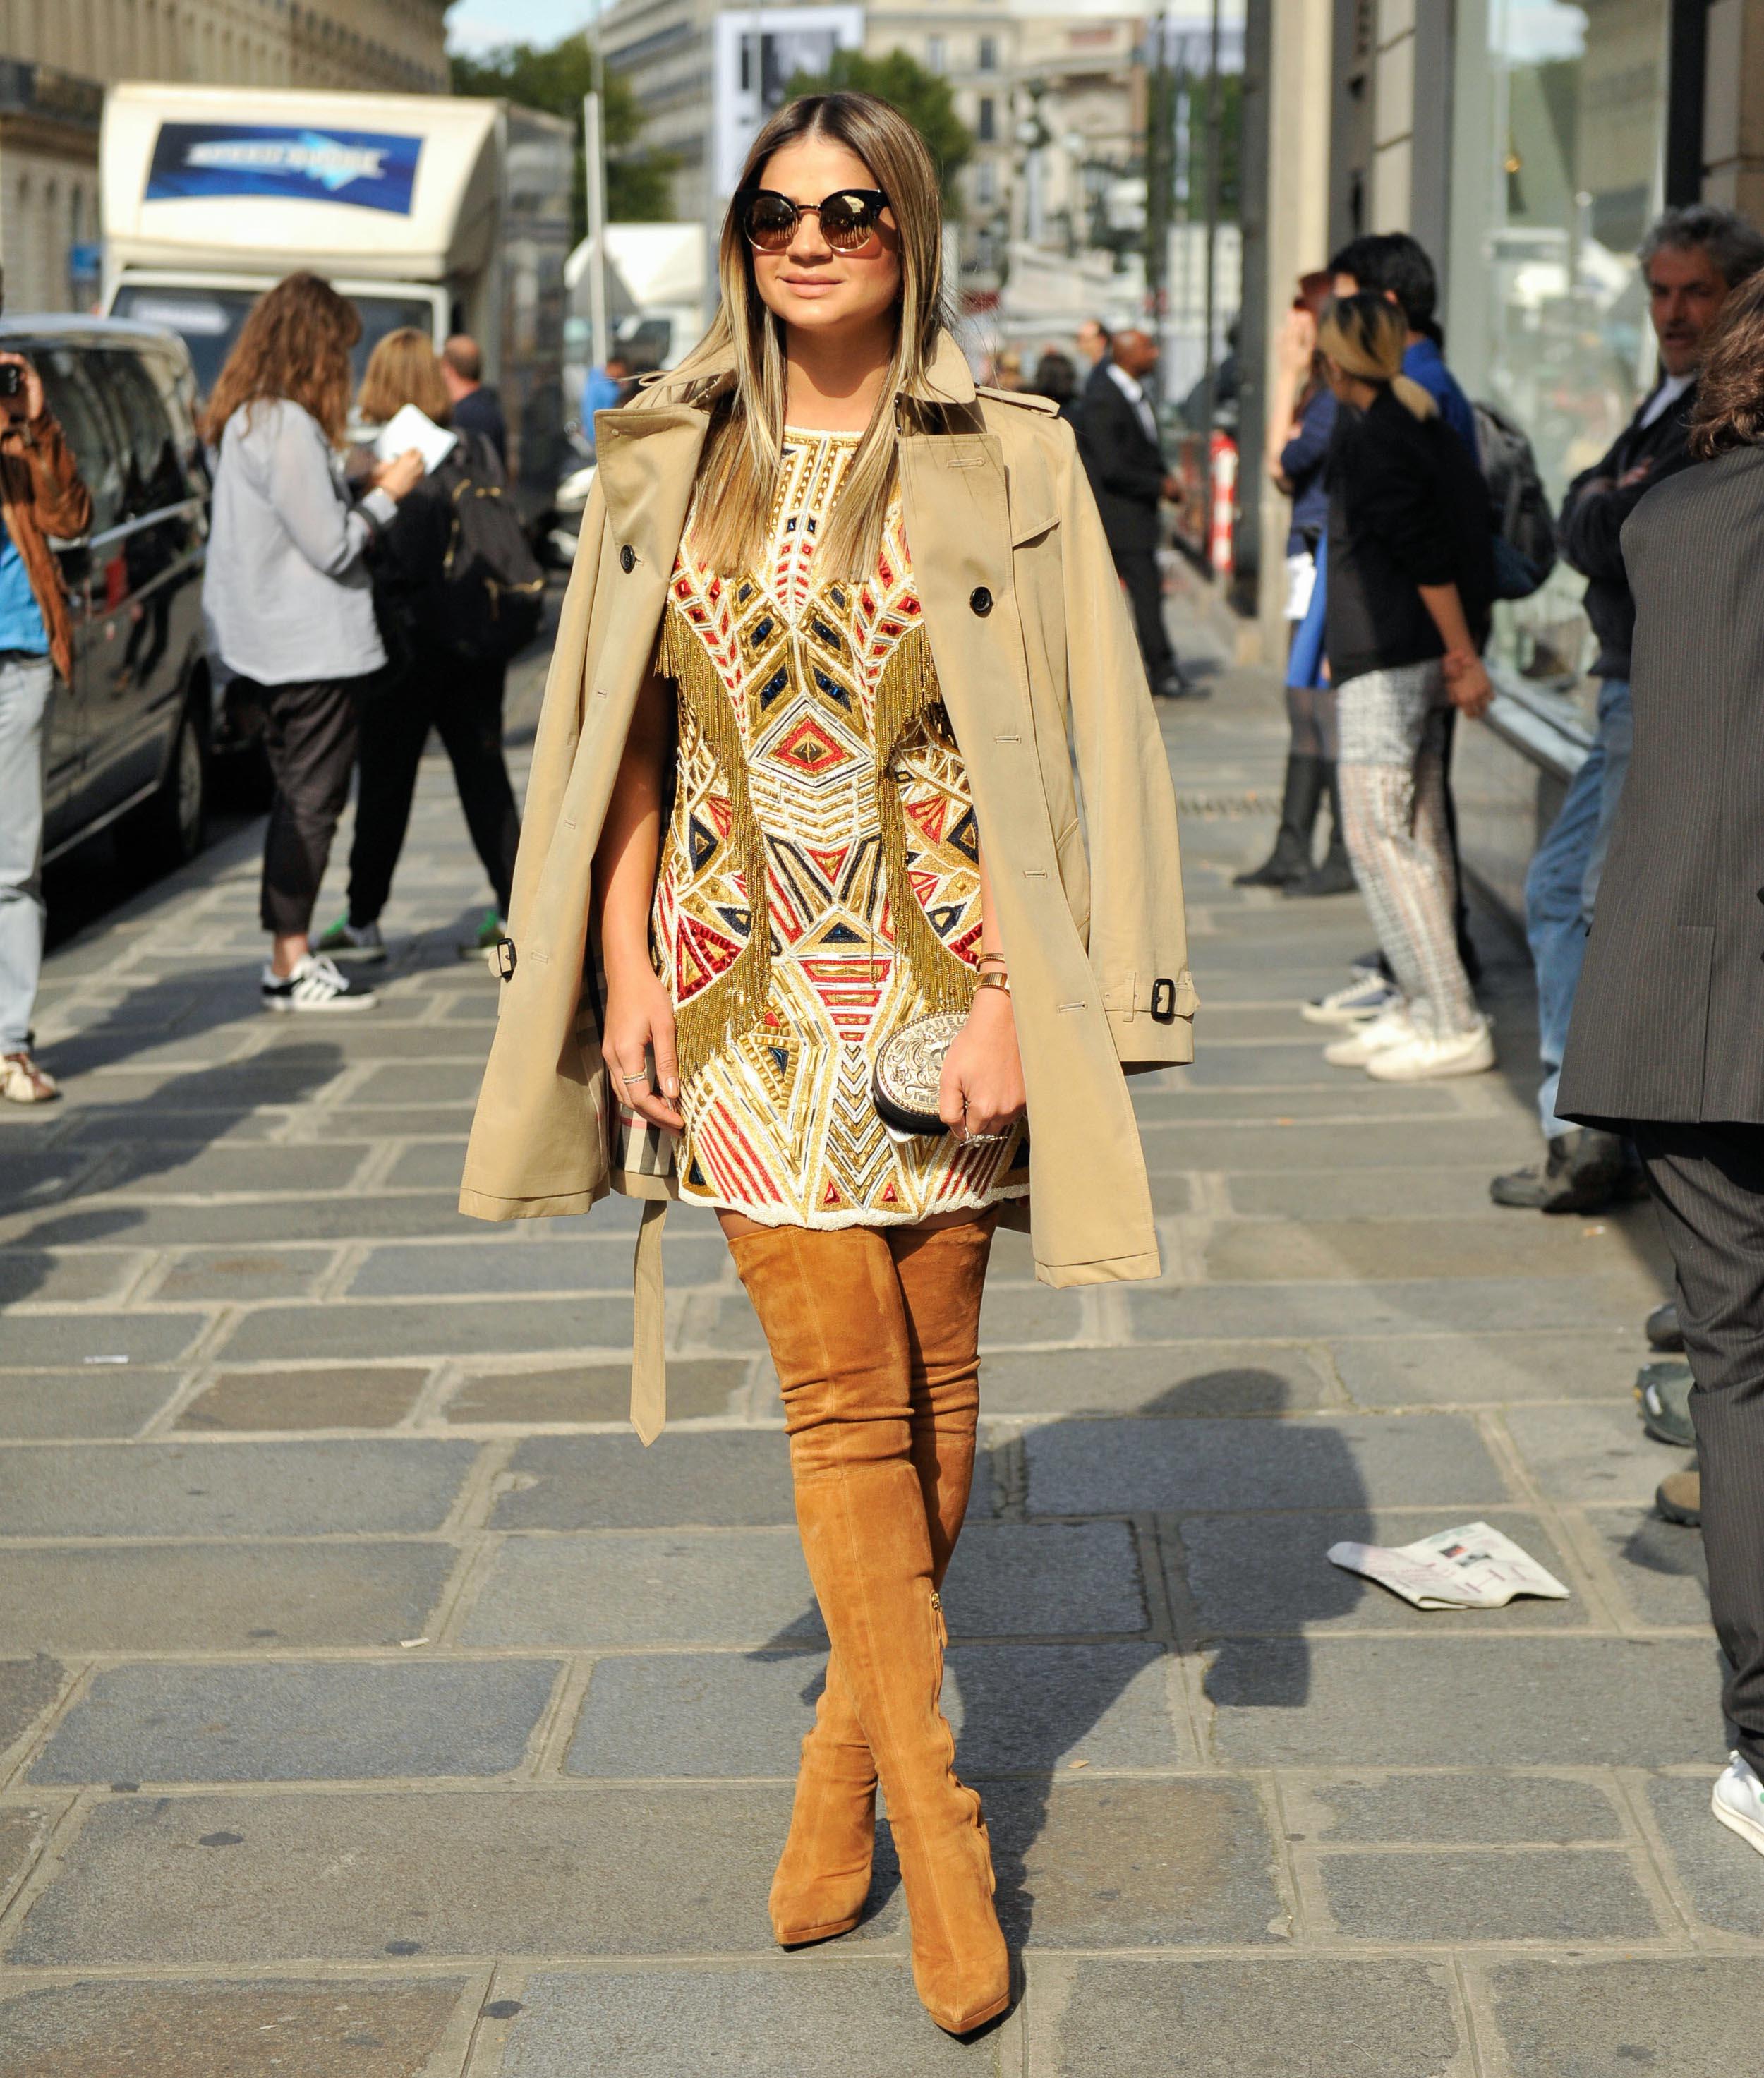 StreetStyle_ParisFashionWeek_LeandroJusten_063.jpg